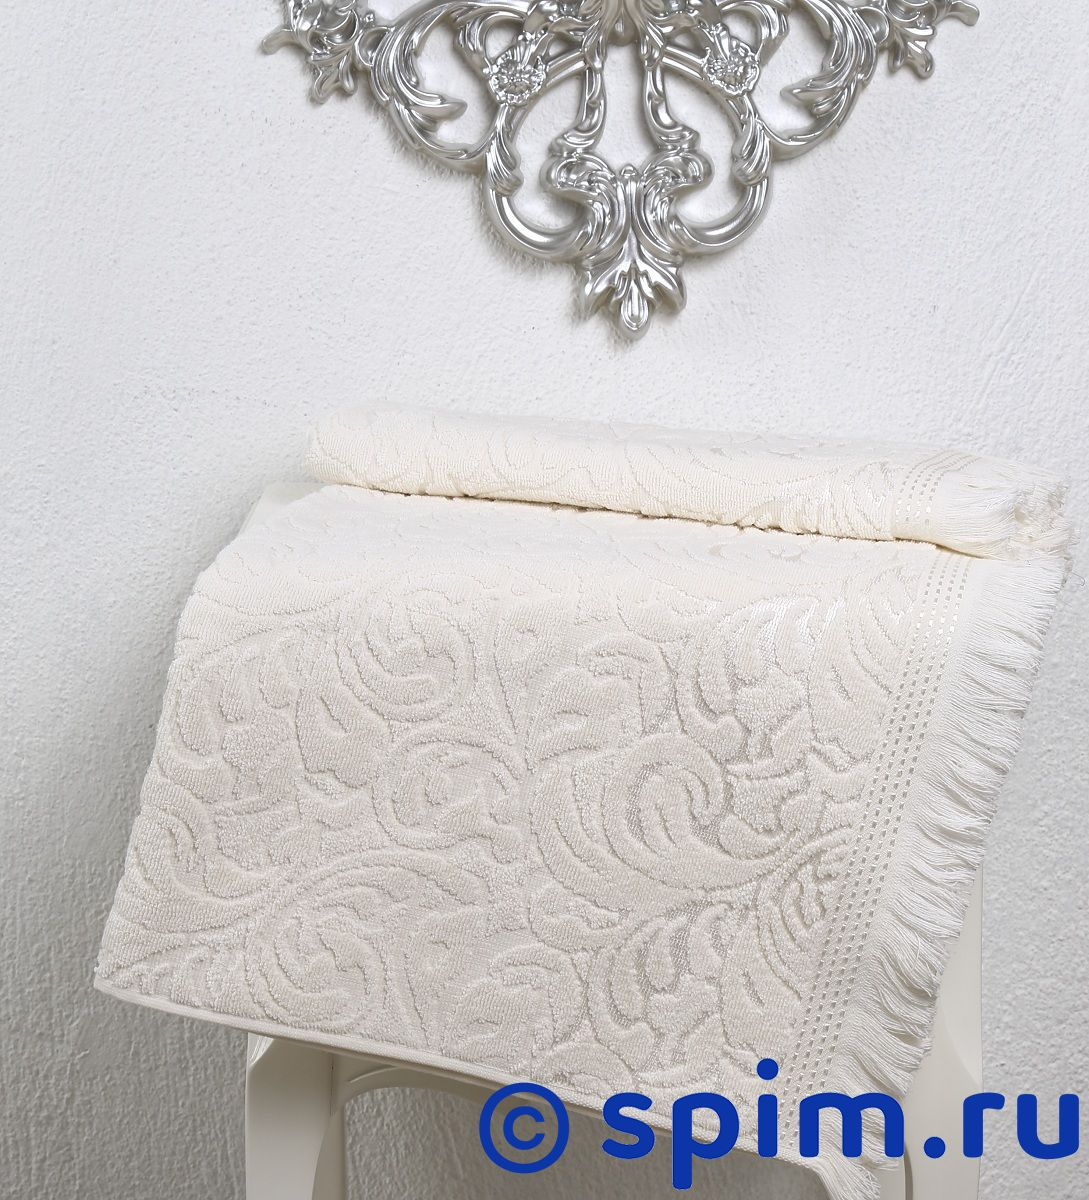 Полотенце Karna Esra 70х140 см, кремовое наматрасник karna с пропиткой 120x200 см